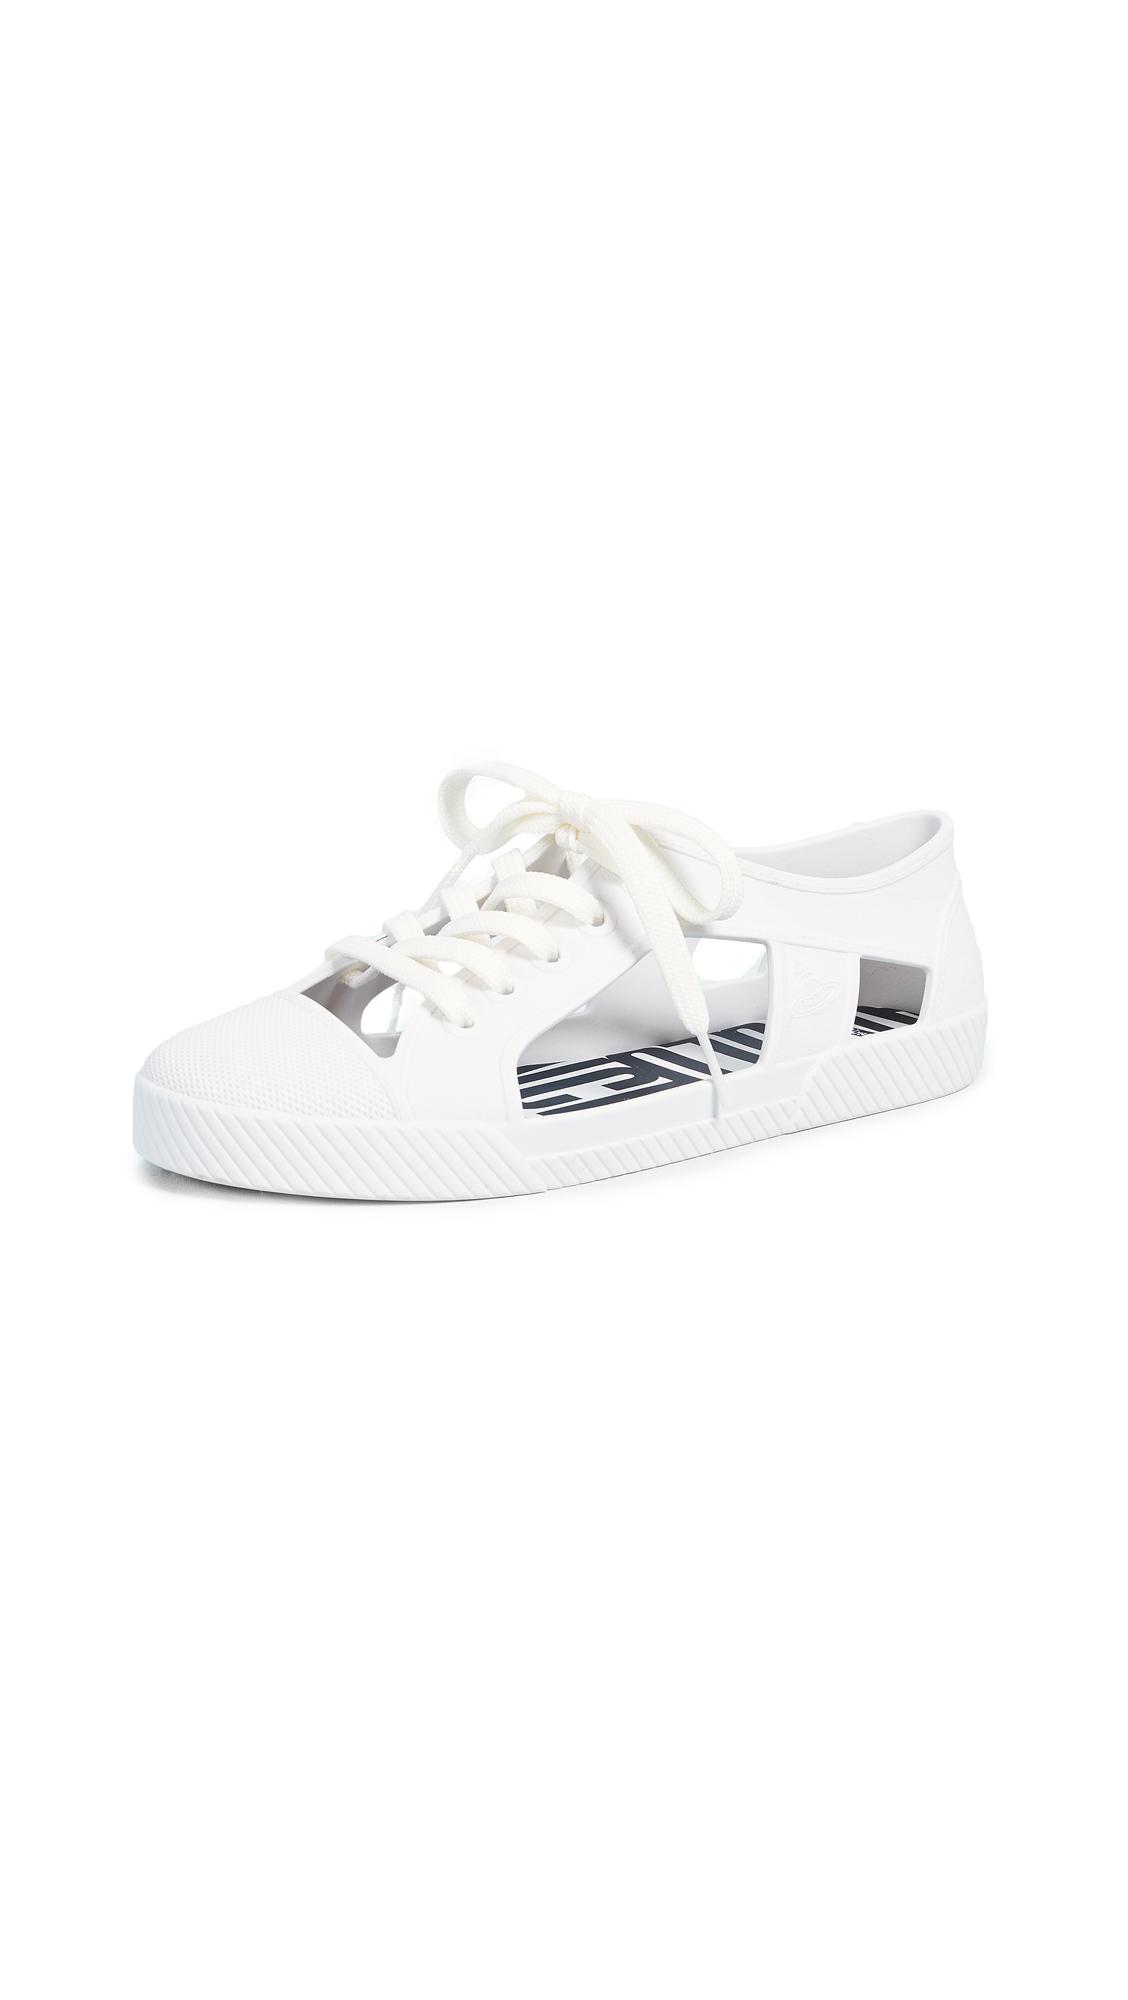 Melissa x Vivienne Westwood Brighton Sneakers - White